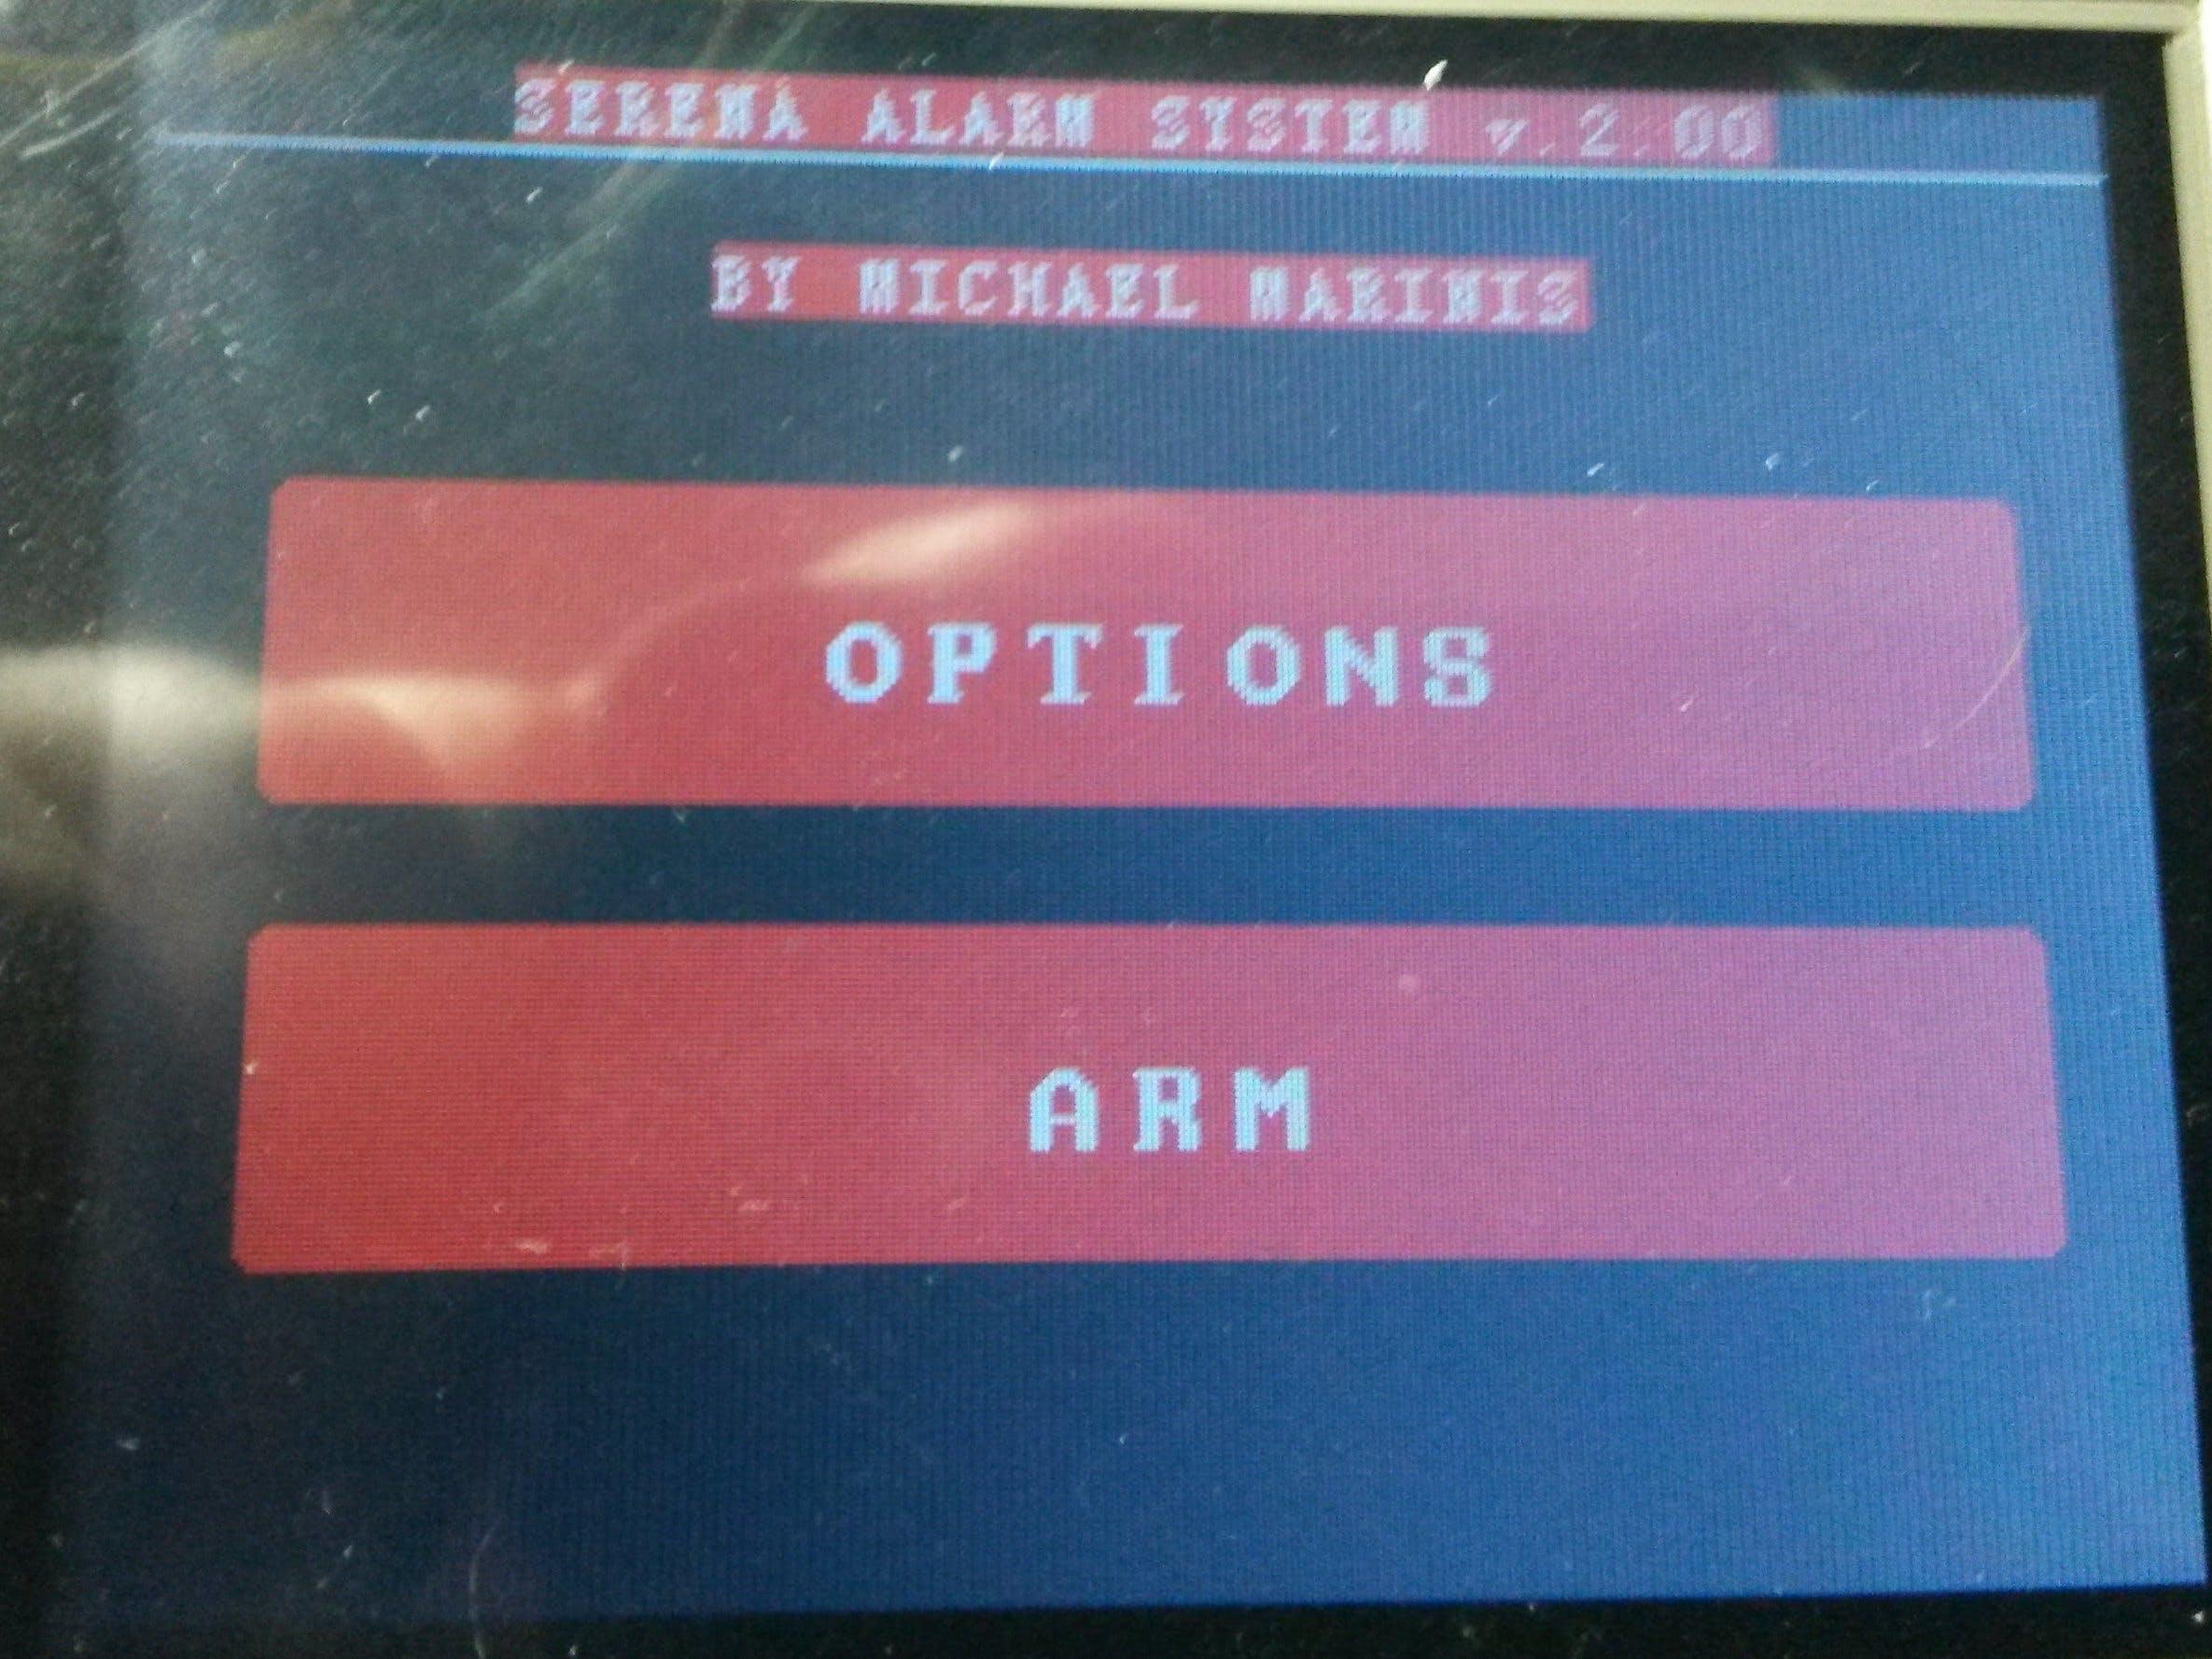 Arduino Alarm System: SERENA